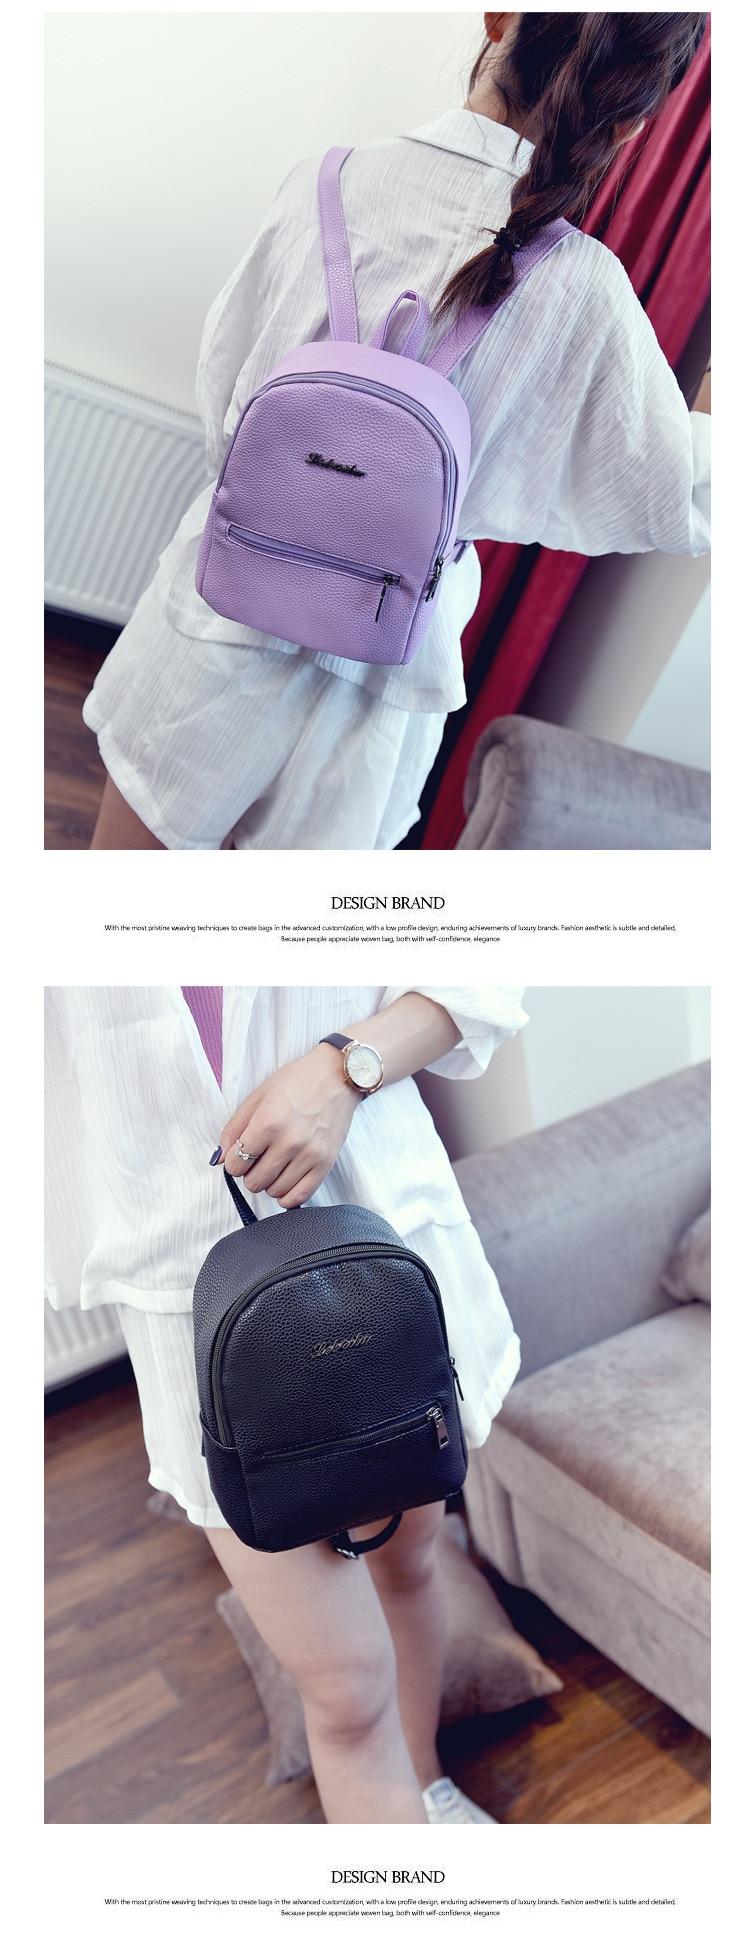 HTB1I9Hhm77mBKNjSZFyq6zydFXaO 2019 New Backpack Summer Small Women Backpack Candy Color Student Travel Shoulder Bags Teenager Girls Female Mochila Bagpack